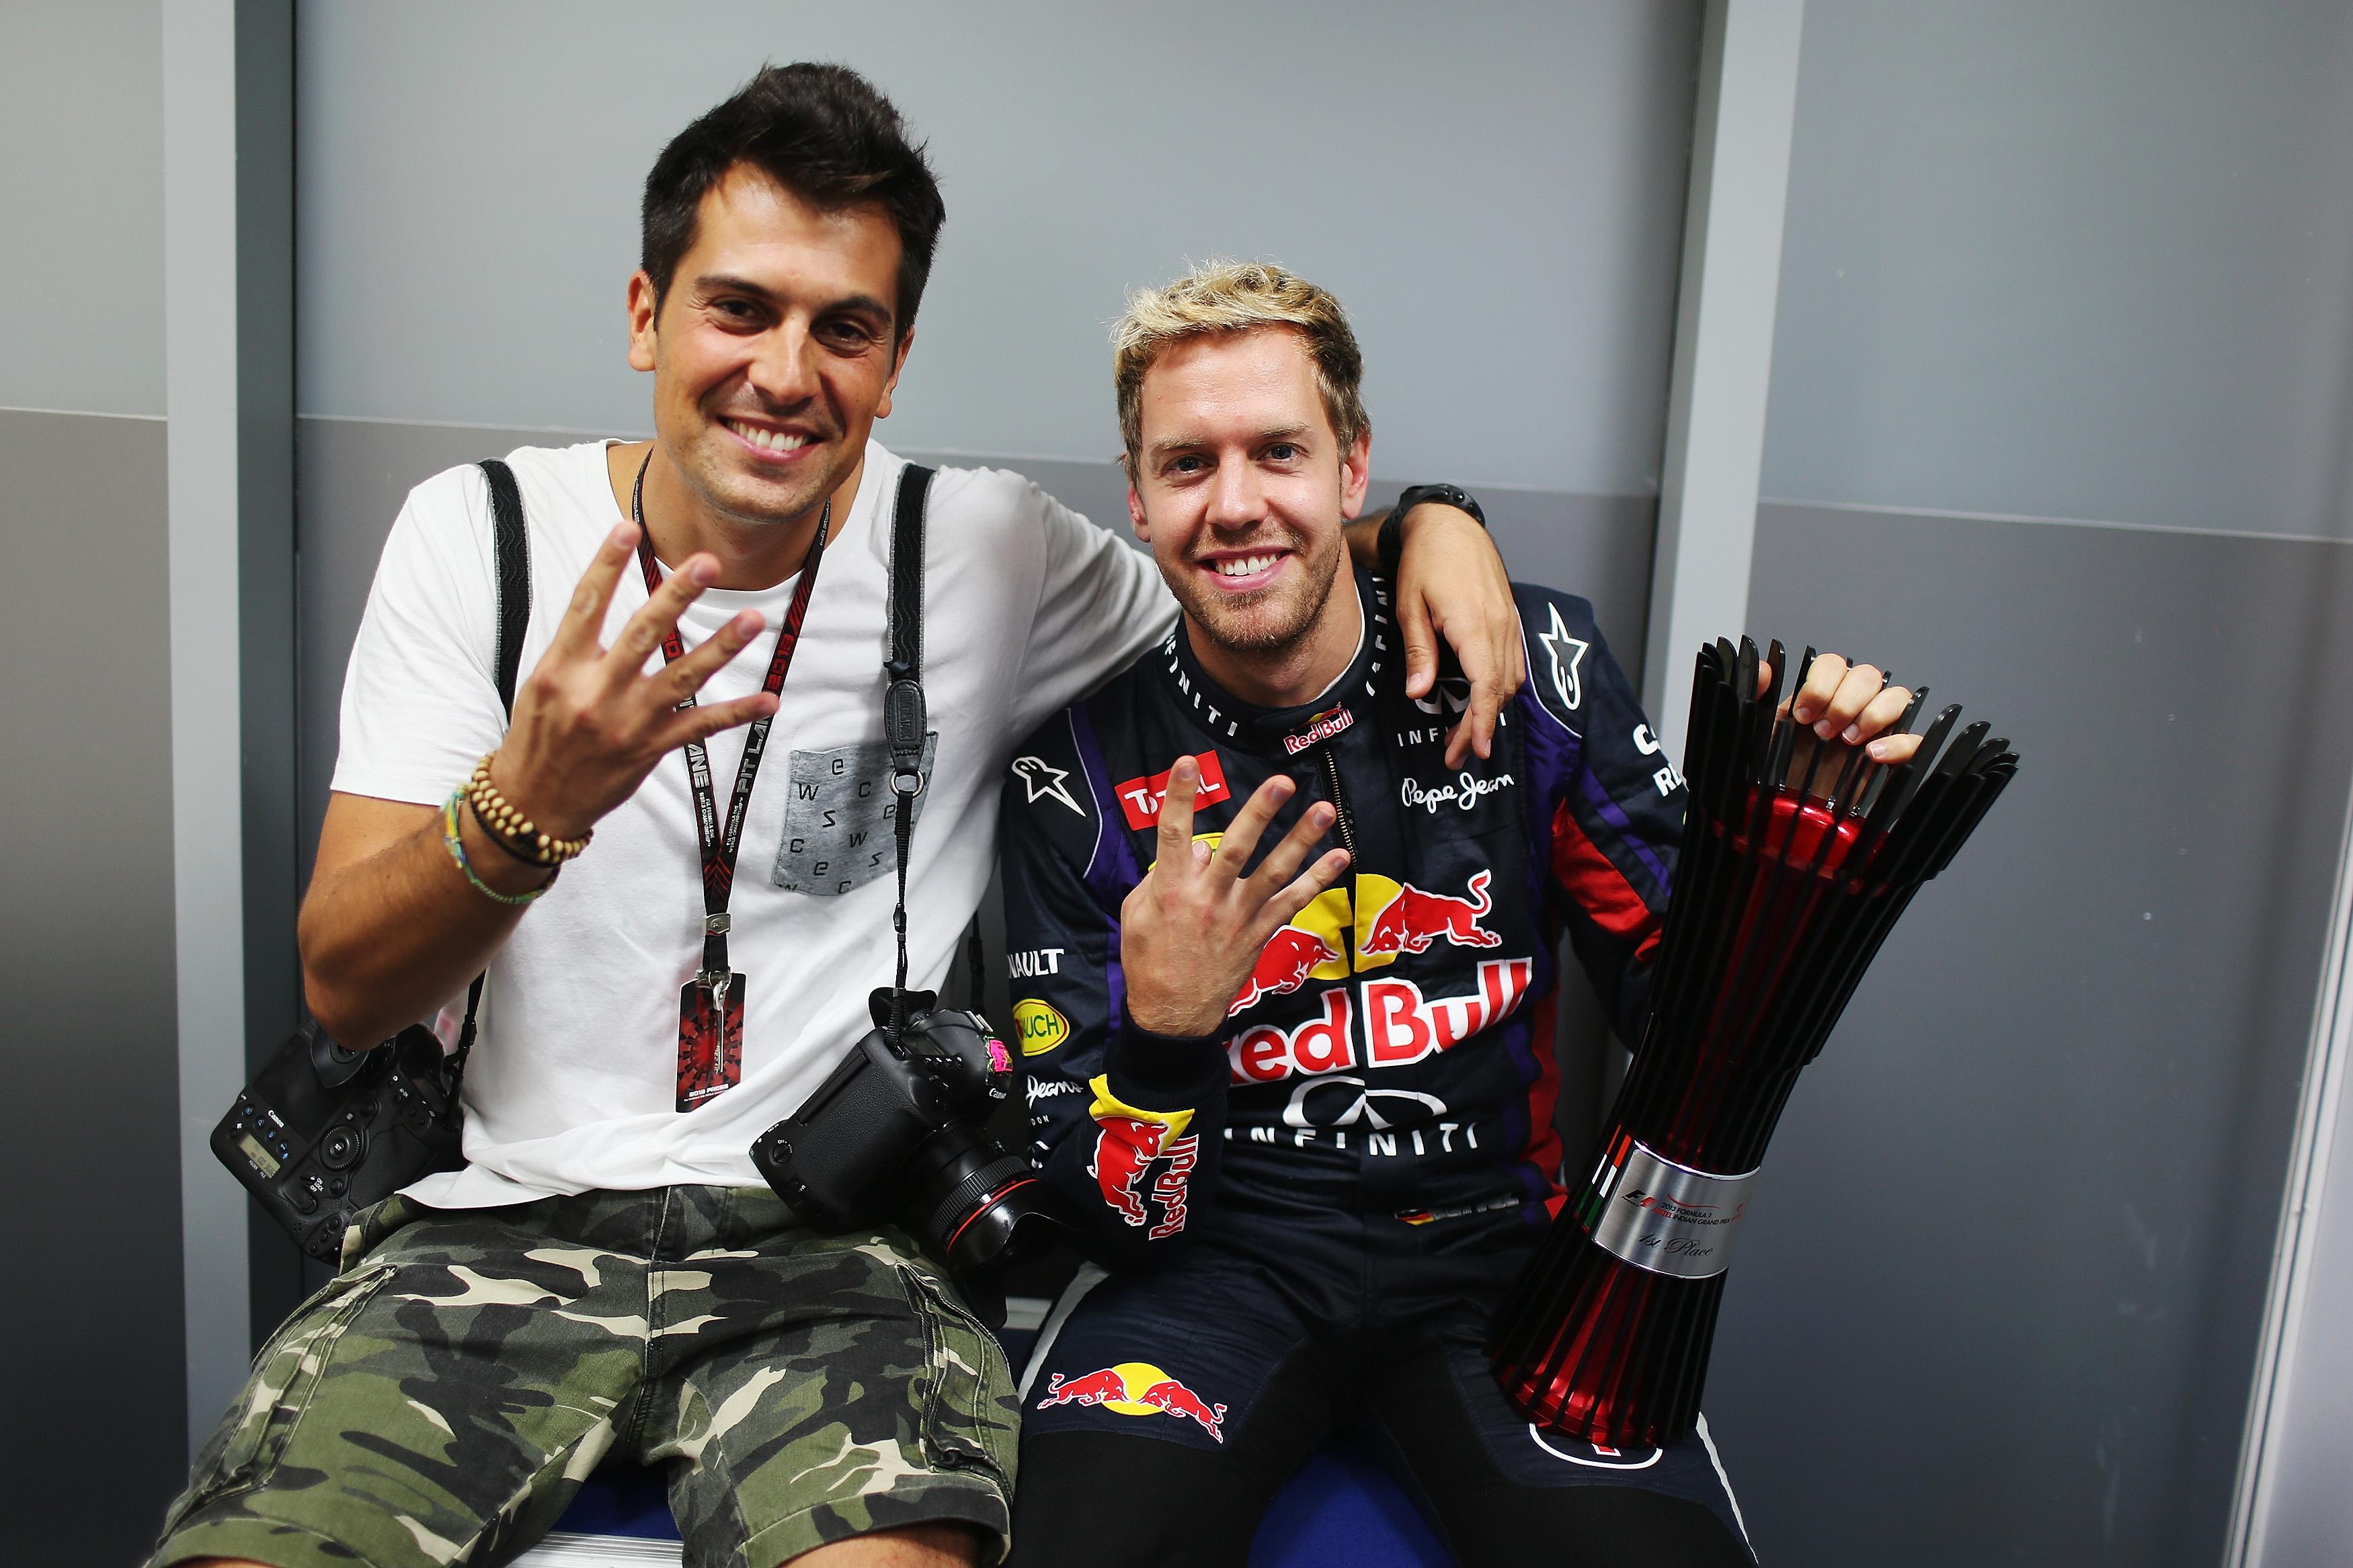 F1 Grand Prix of India - Race